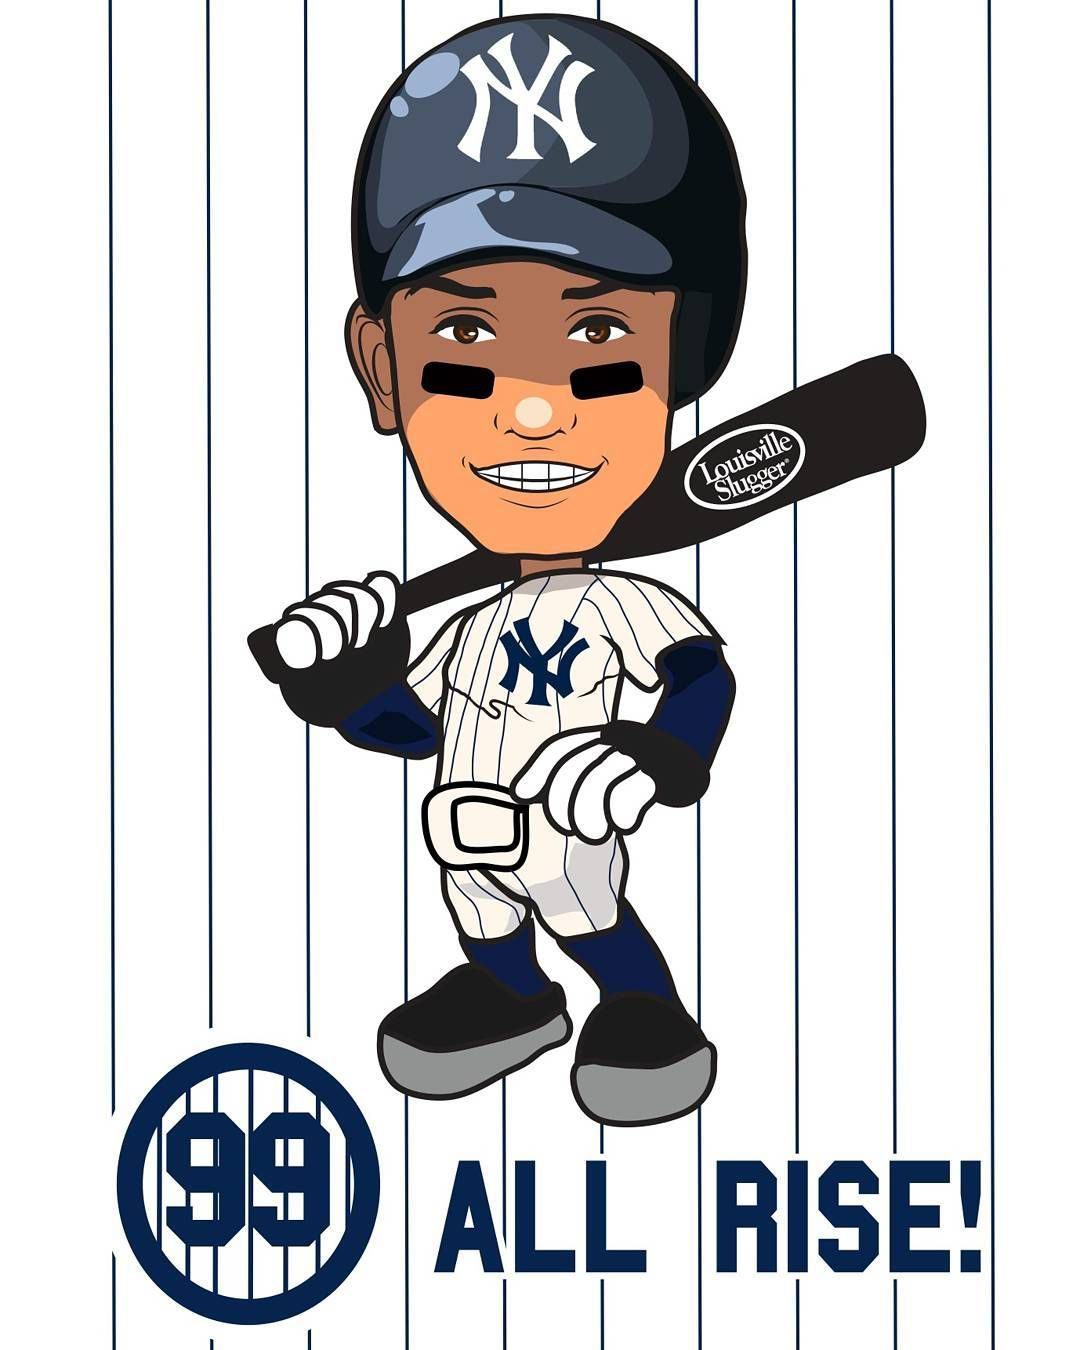 New York Yankees 99 Aaron Judge Nyy Newyorkyankees Newyork Yankees 99 Rightfielder Icon Rookie Right Yankees Poster New York Yankees New York Yankees Baseball